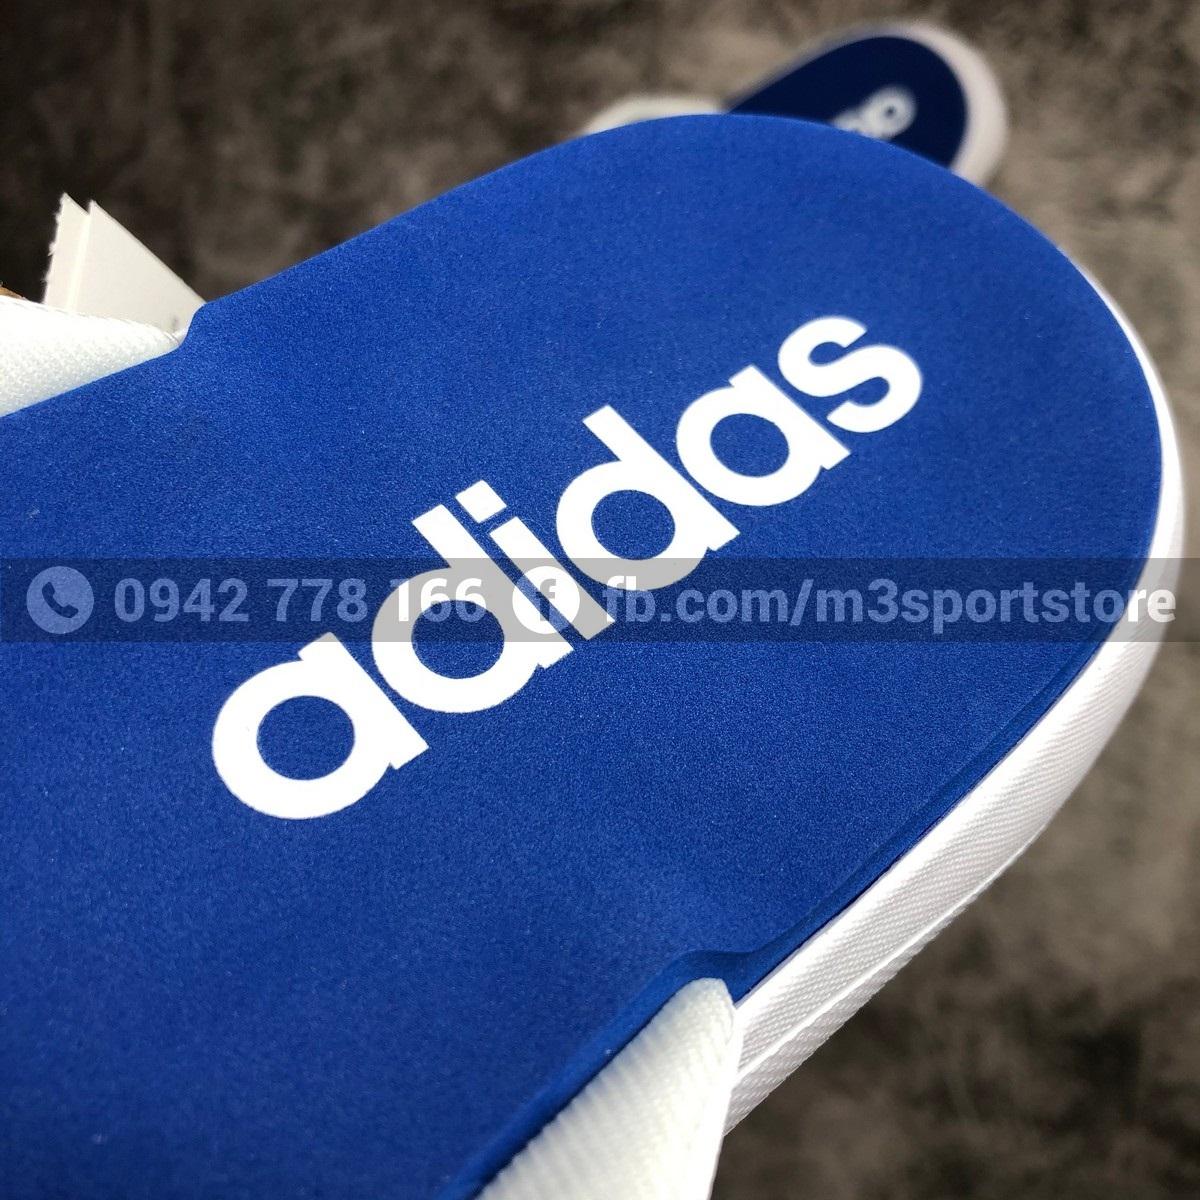 Tông thể thao nam Adidas Comfort Flip-Flops FY8655